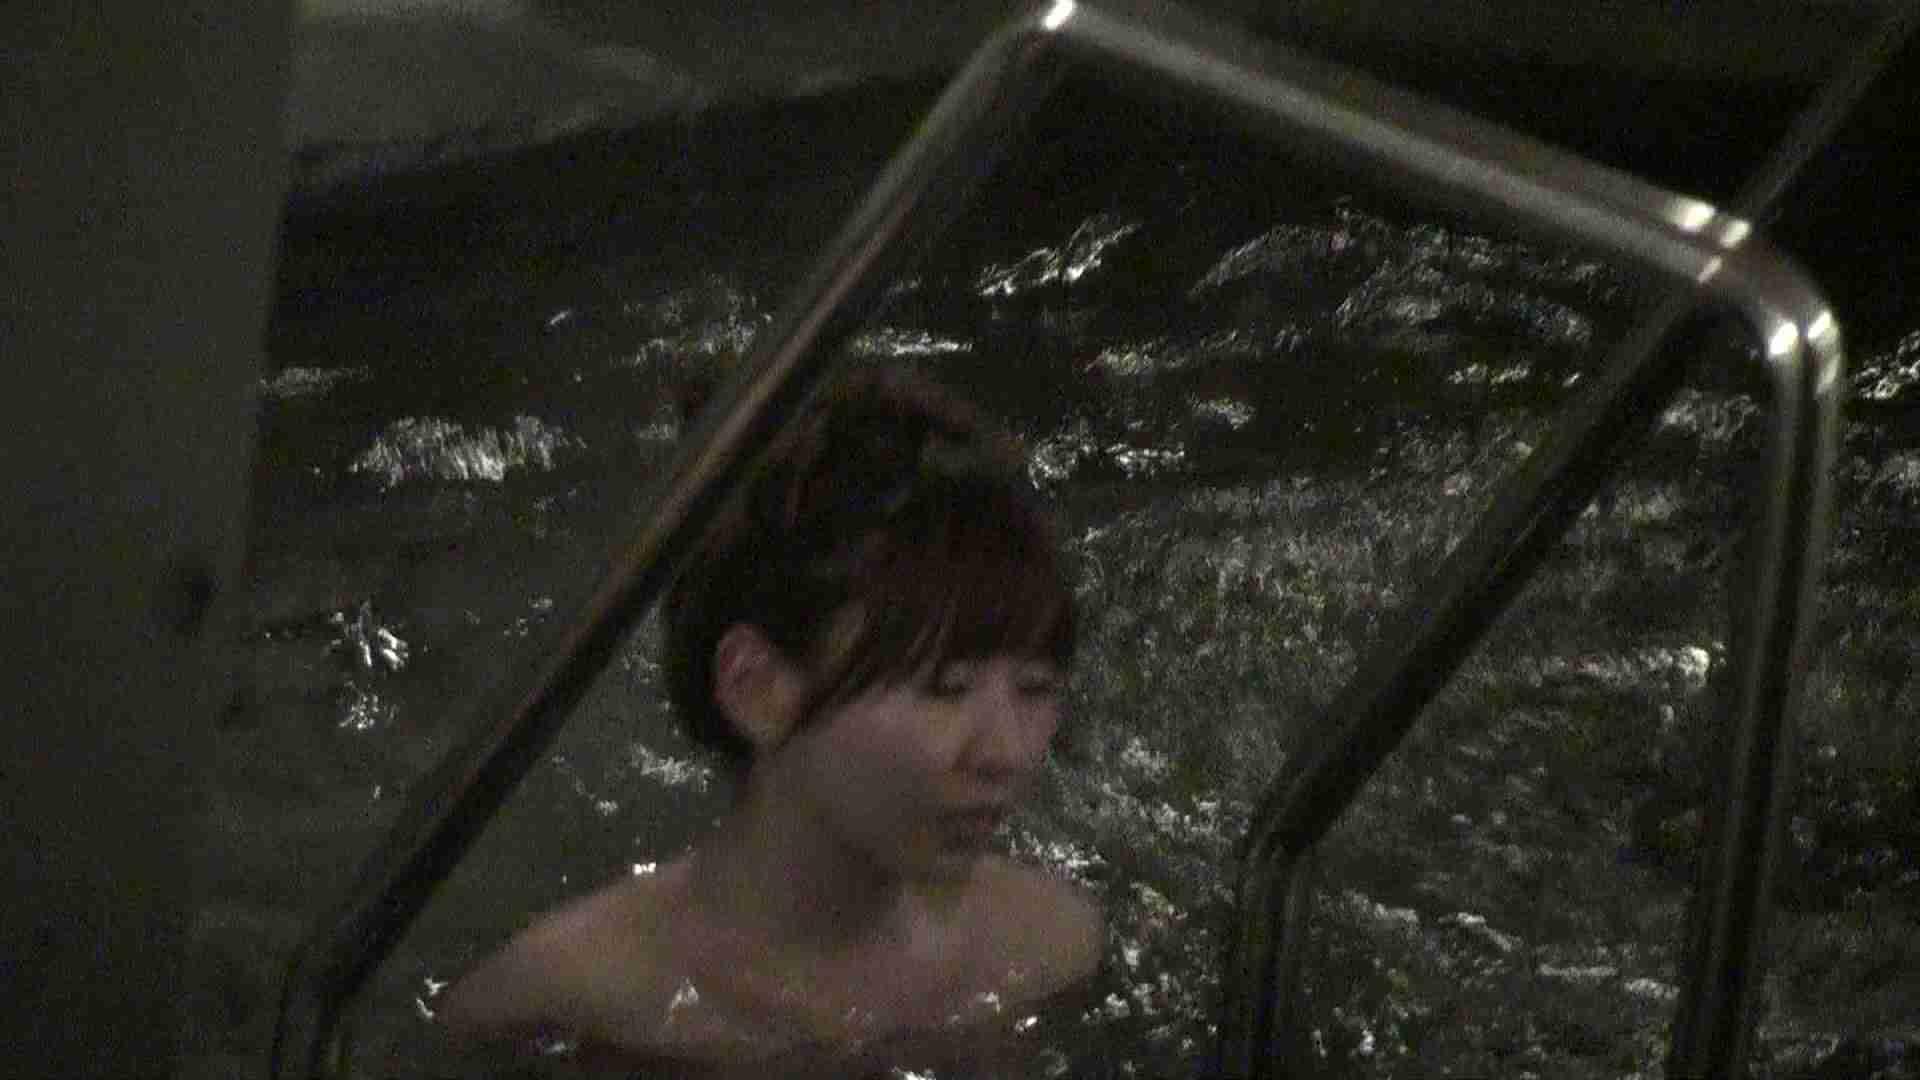 Aquaな露天風呂Vol.410 HなOL | 0  76pic 65